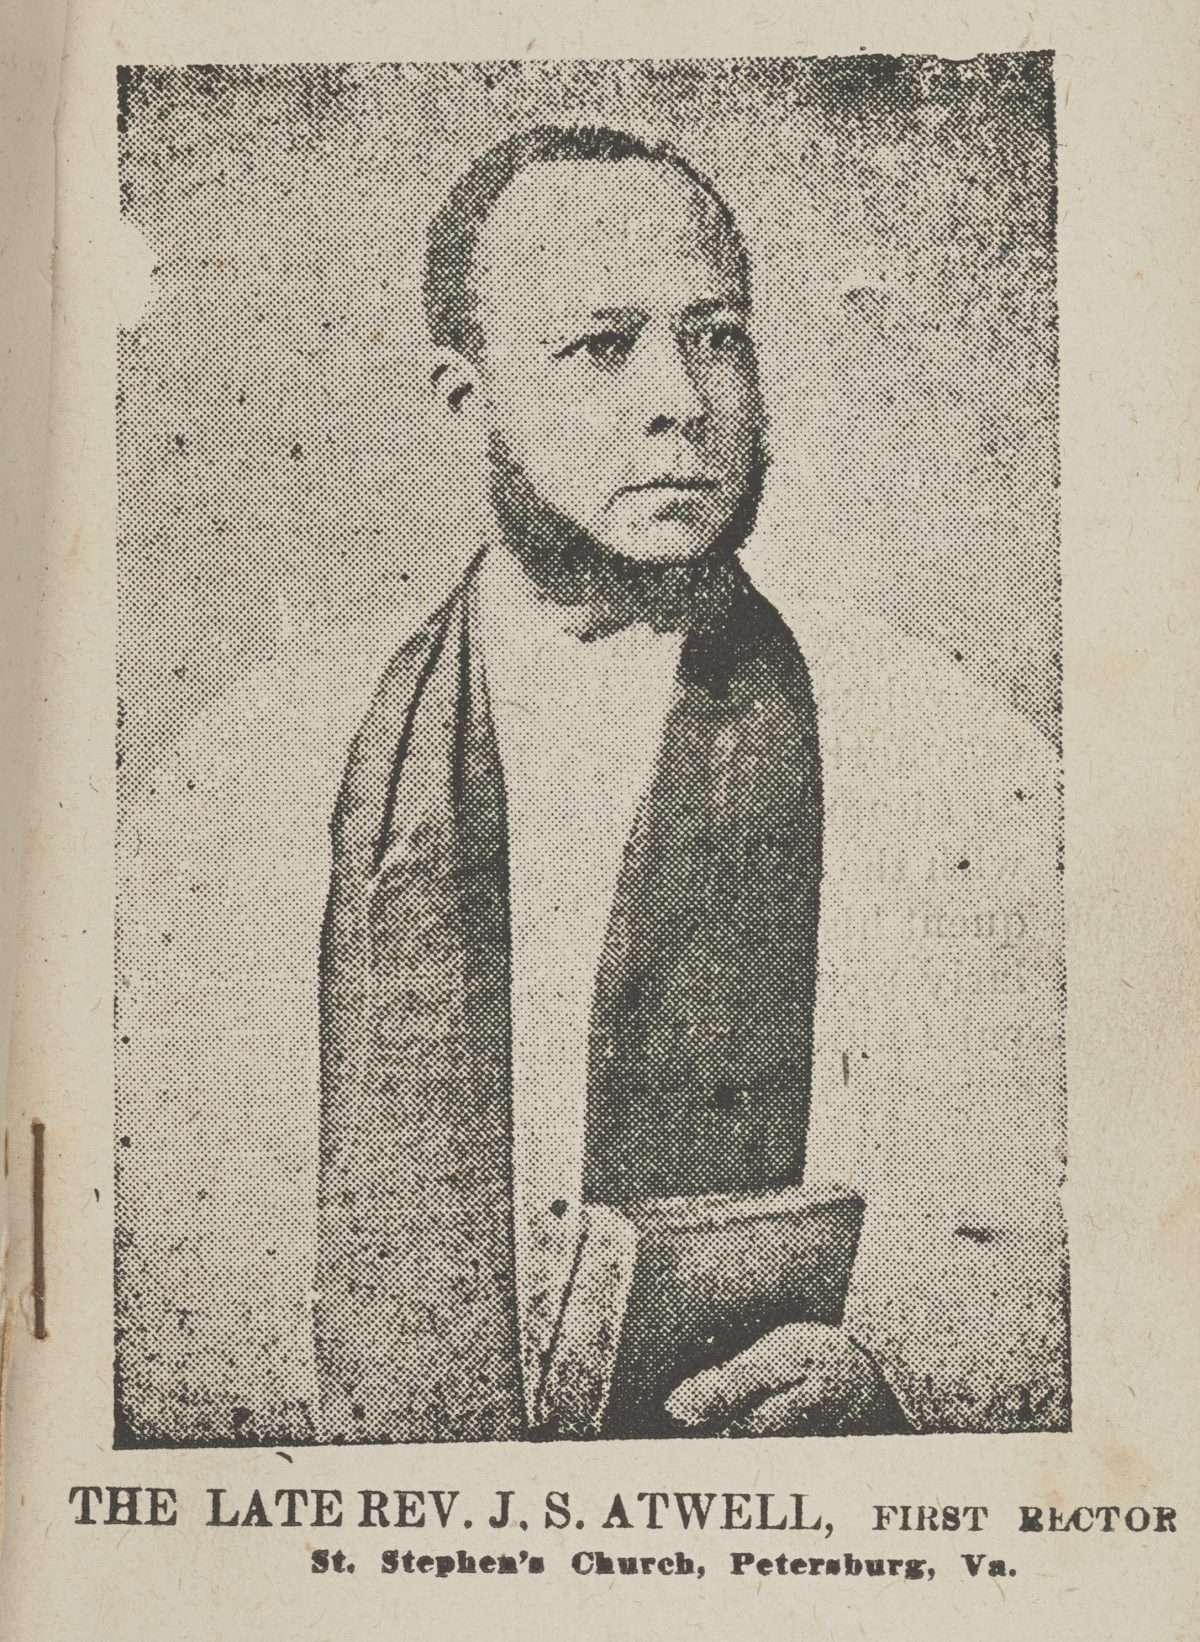 Joseph S. Atwell